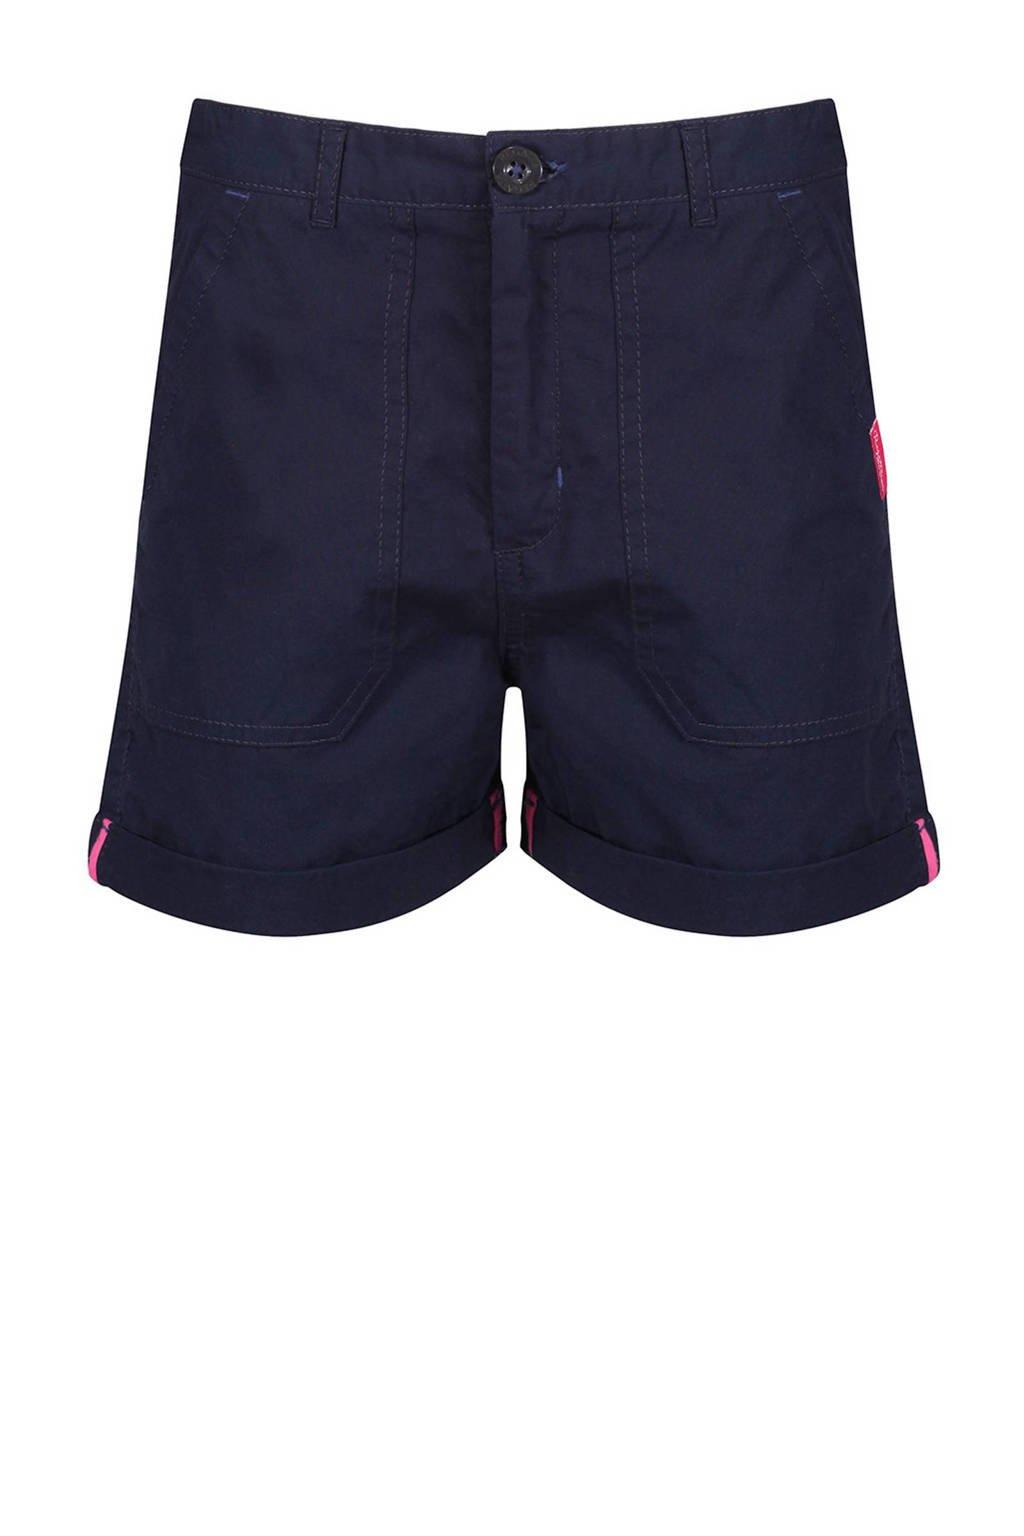 Regatta meisjes Damzel outdoor short blauw, Donkerblauw